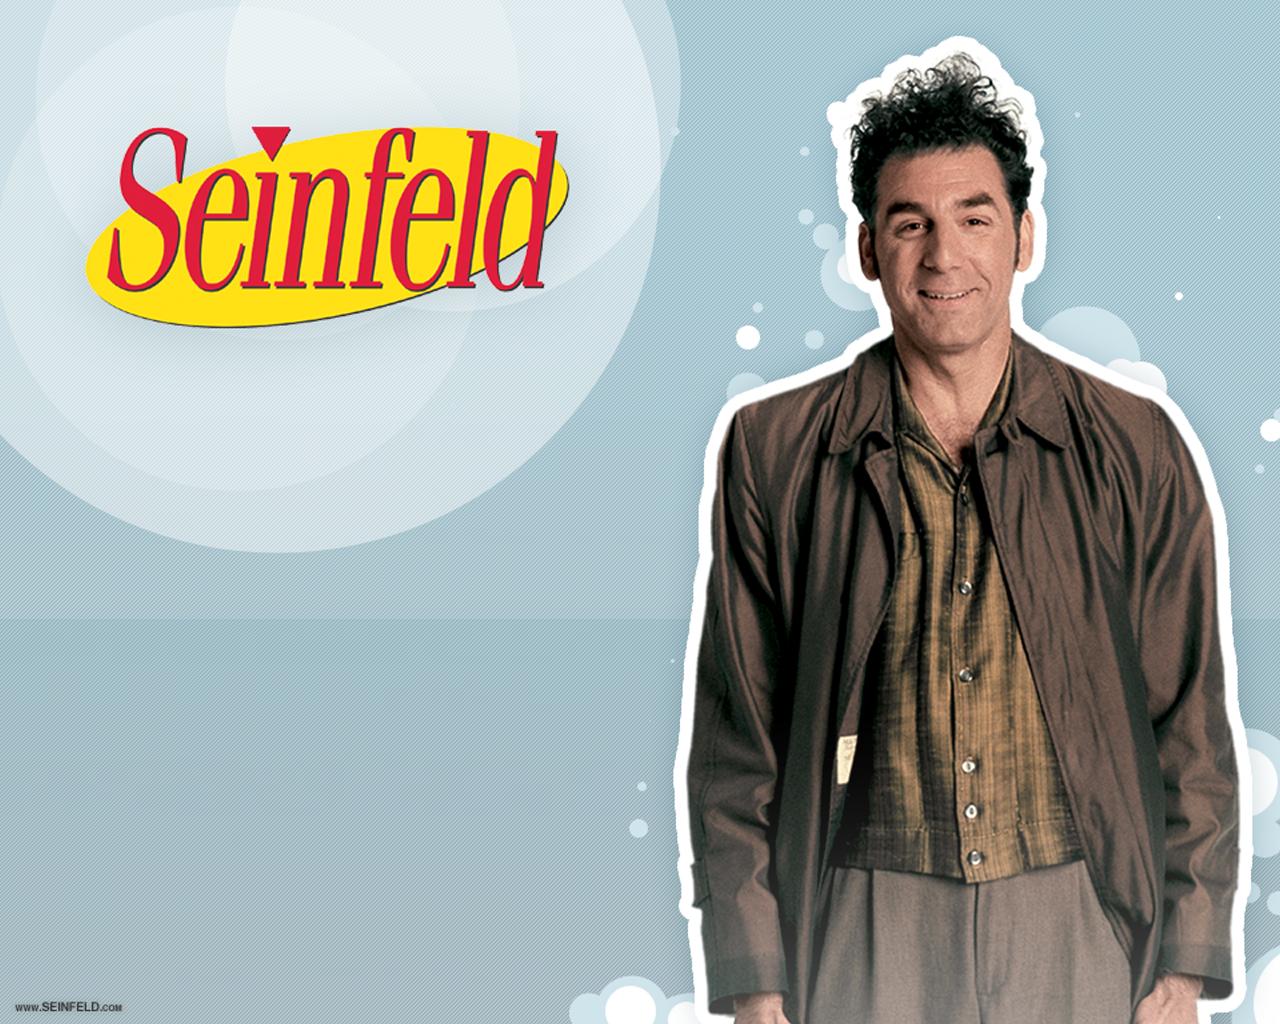 Seinfeld-seinfeld-424999_1280_1024